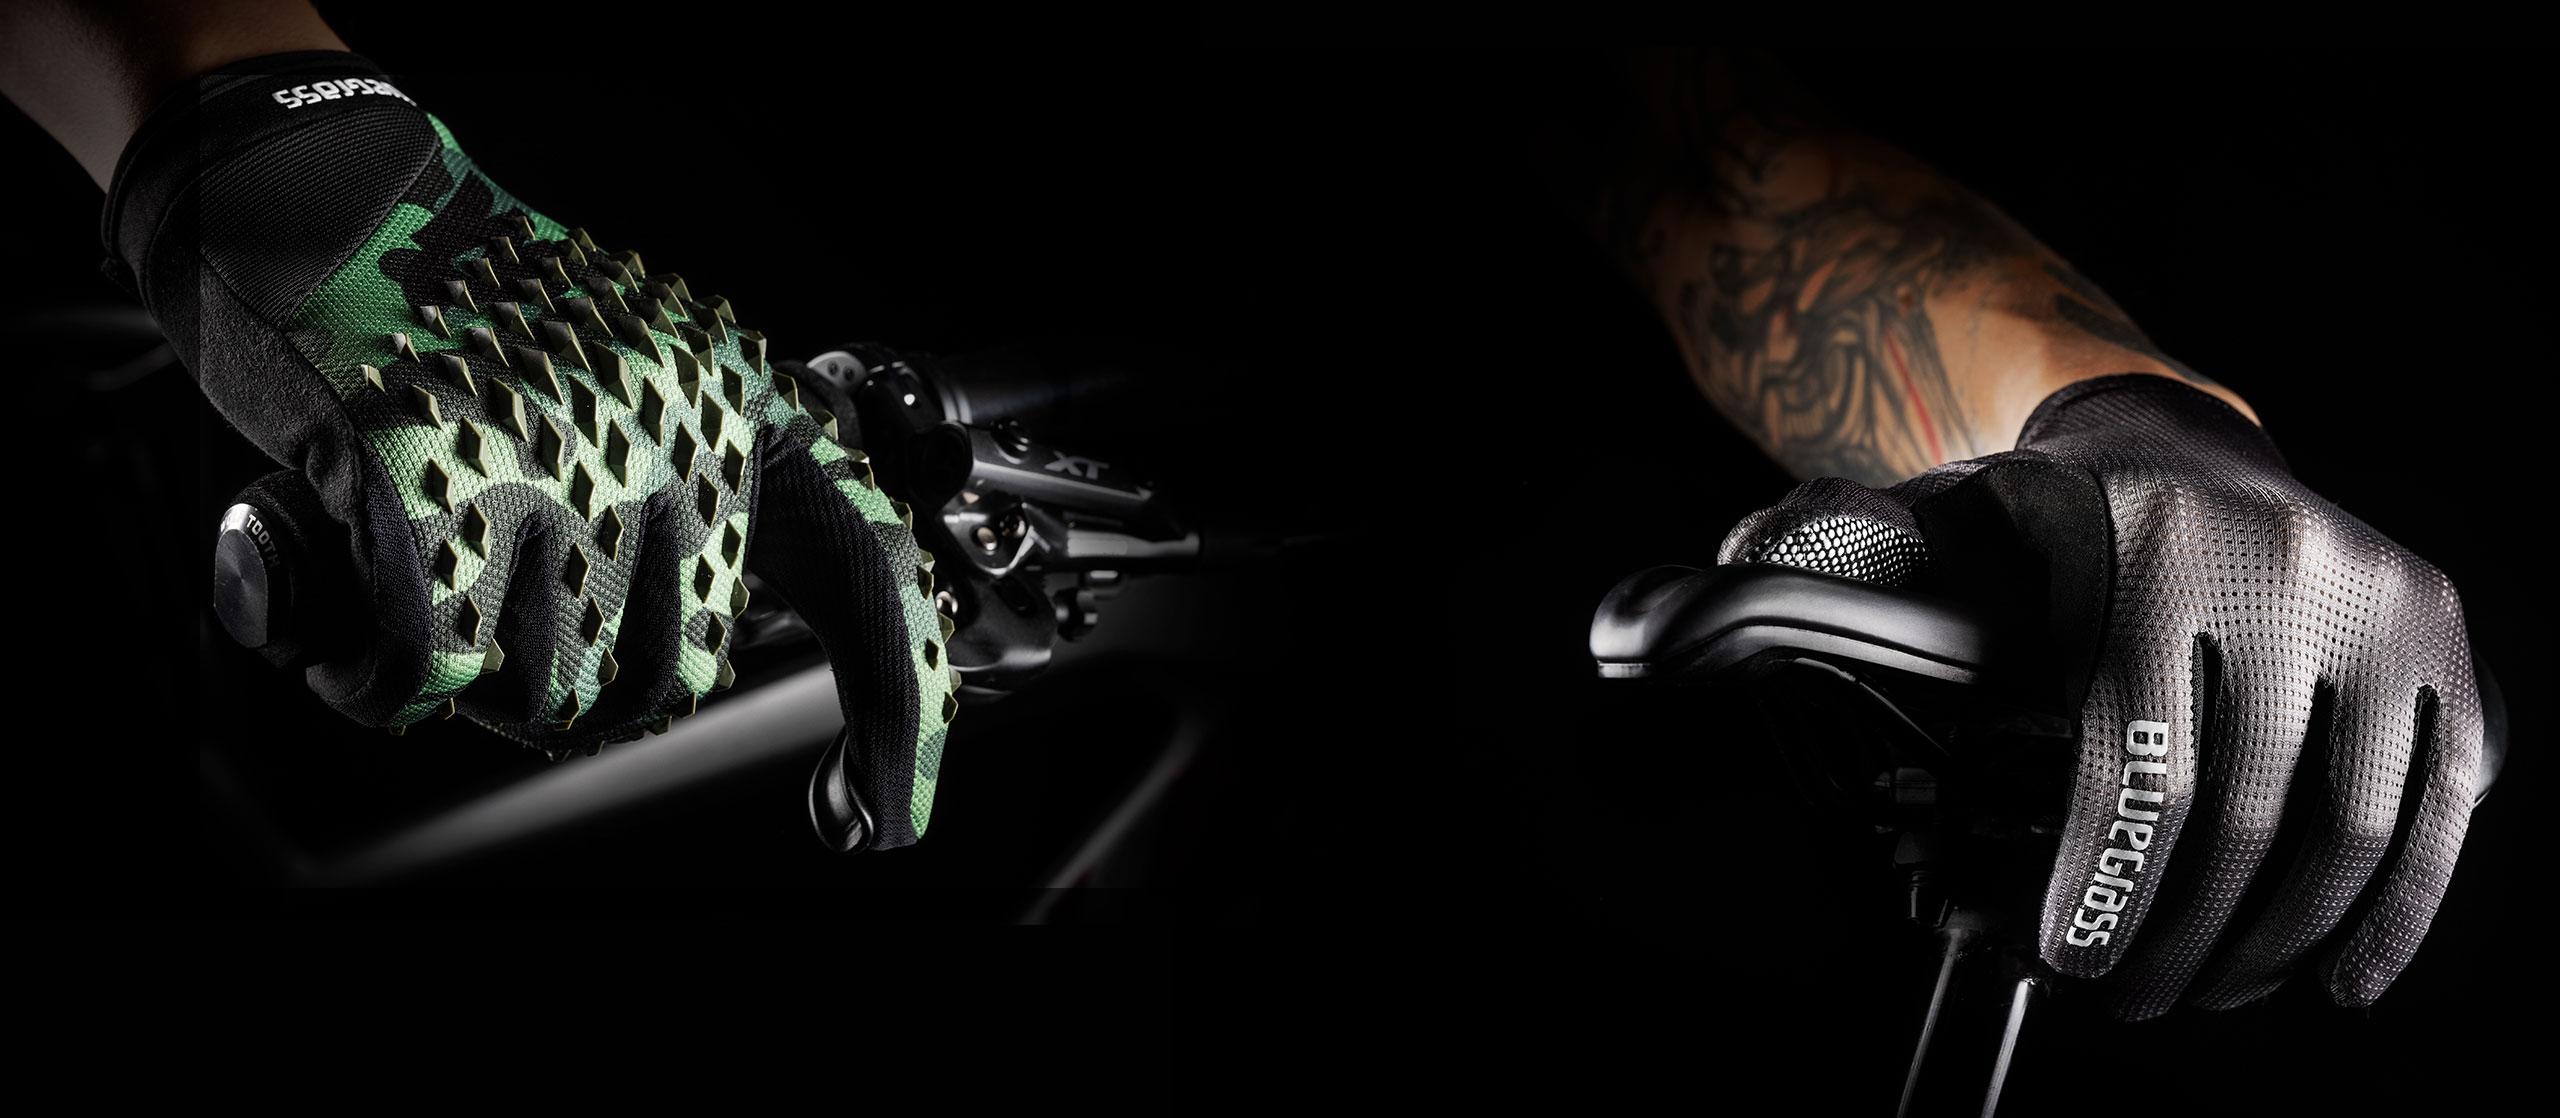 Bluegrass new range of MTB Gloves for Enduro, Trail, DH, BMX and E-MTB